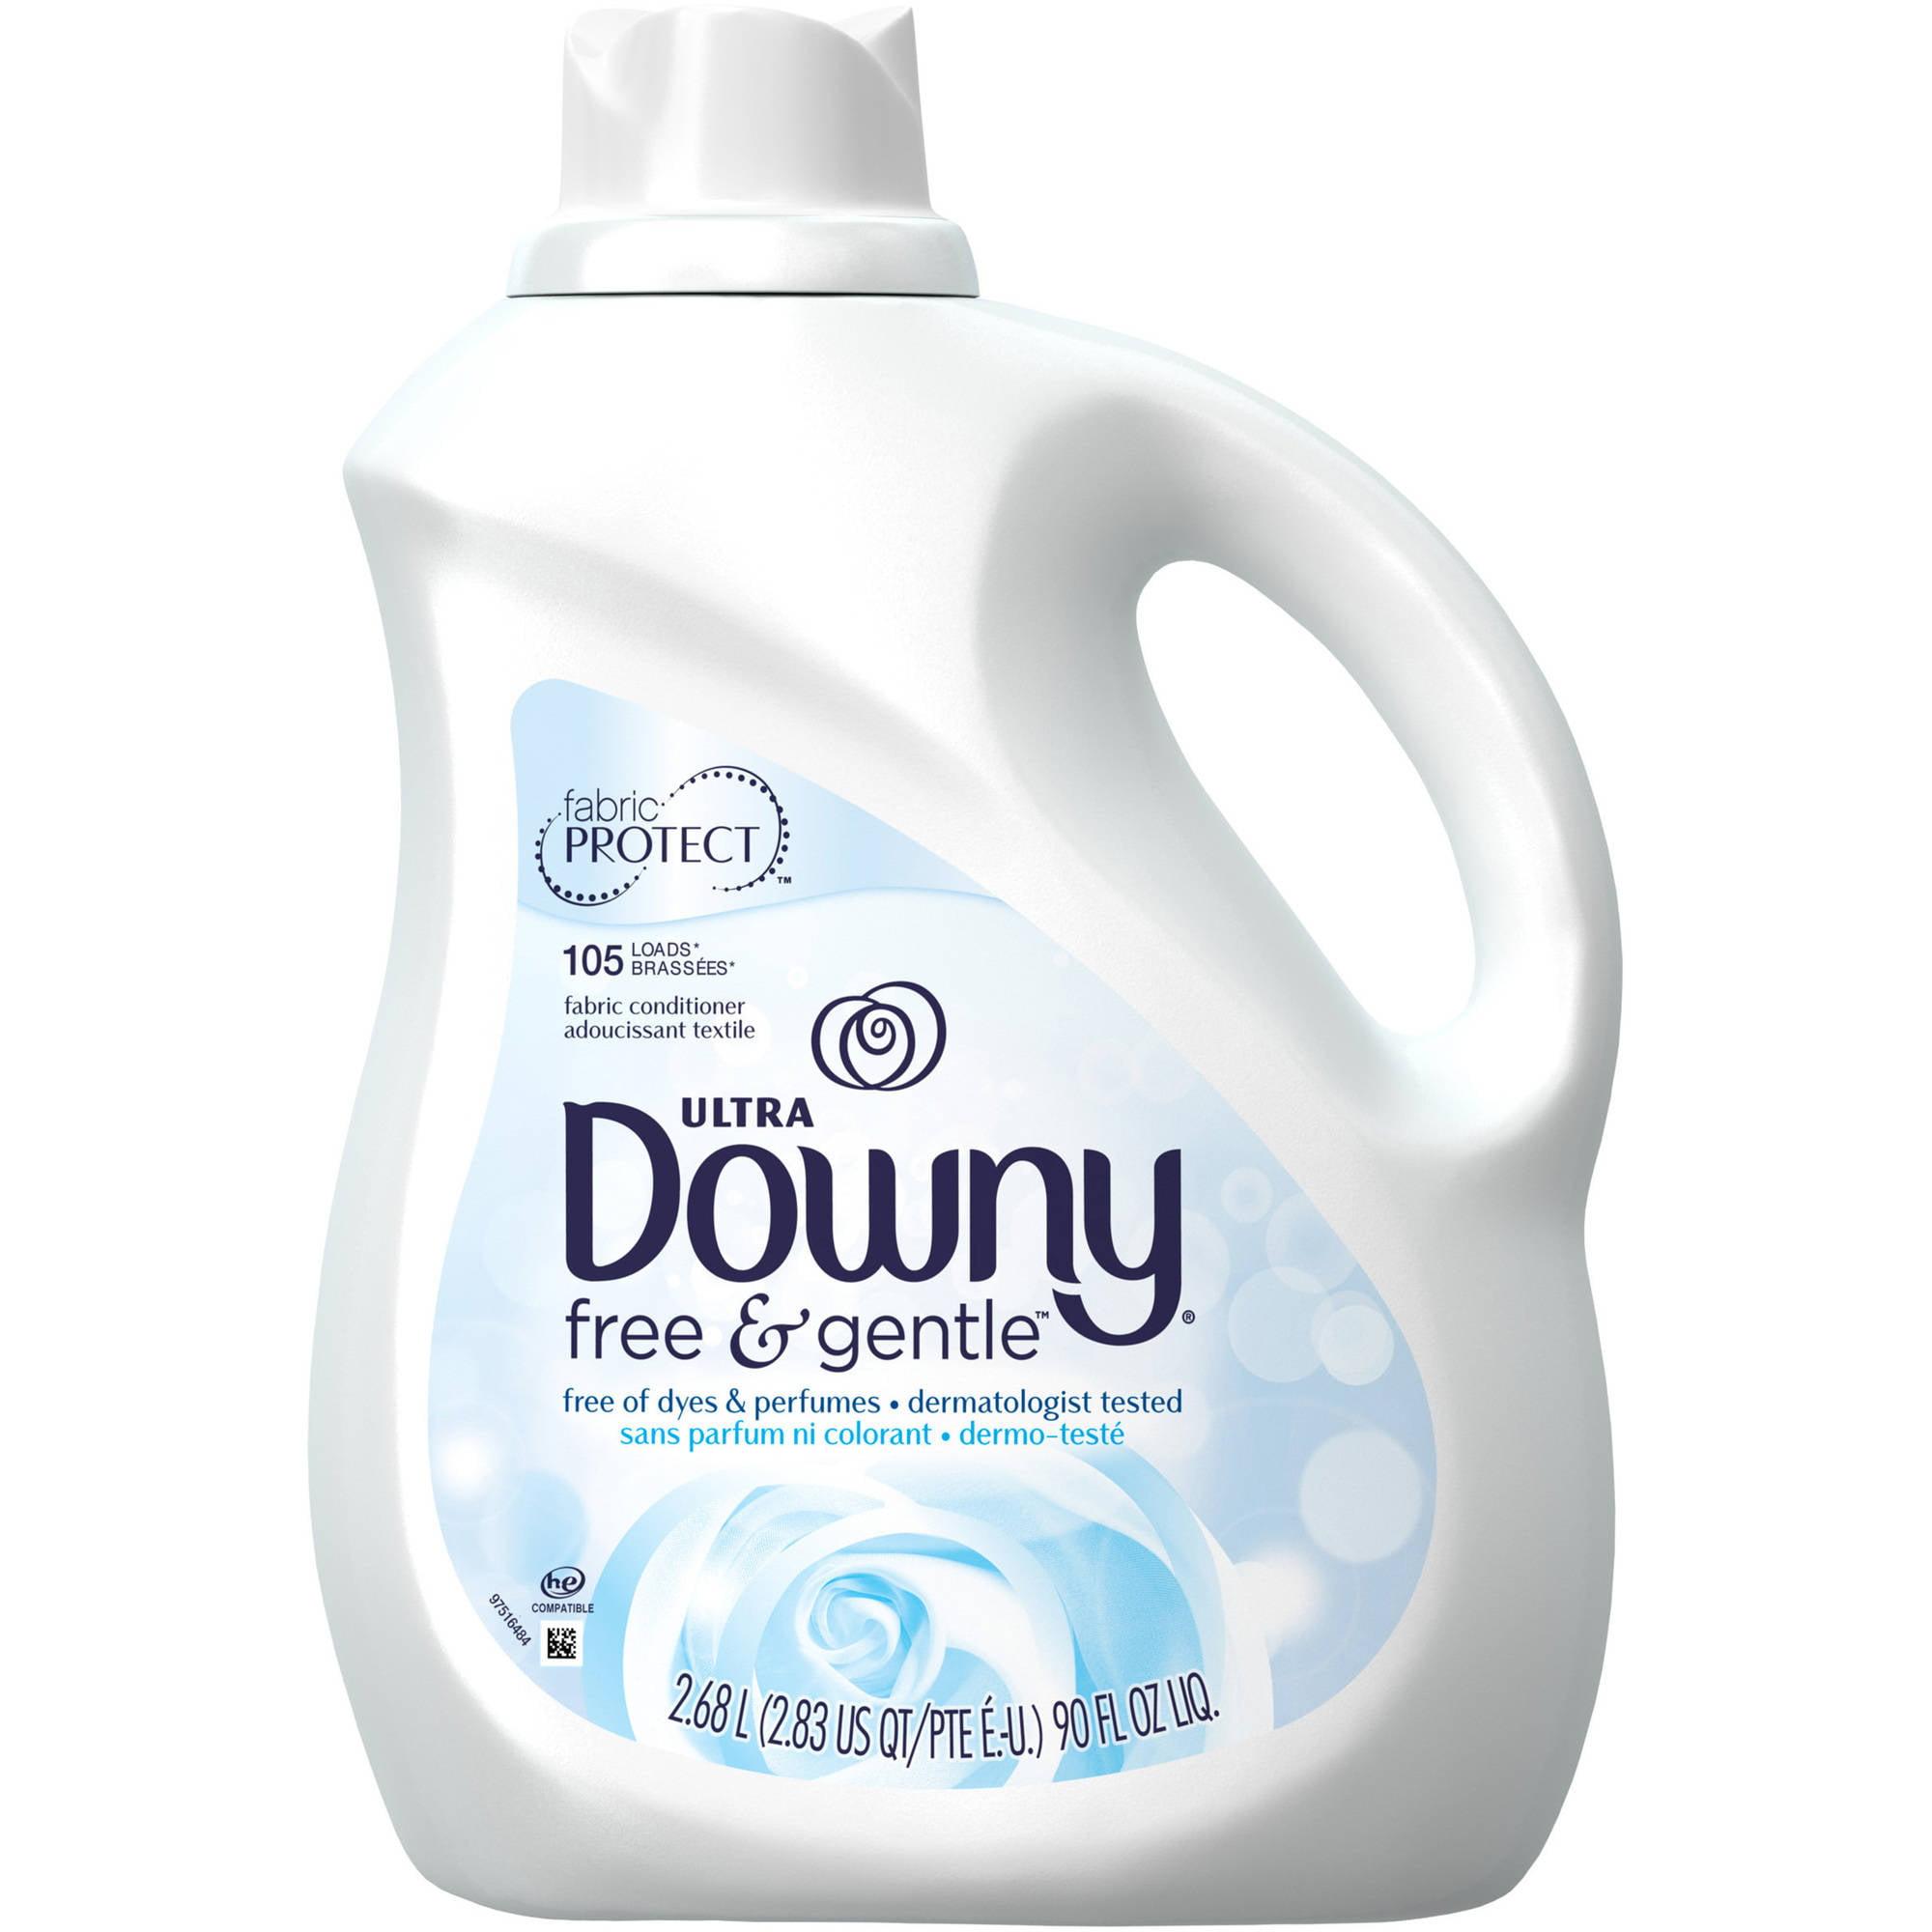 Ultra Downy Free & Gentle Liquid Fabric Conditioner, 90 fl oz